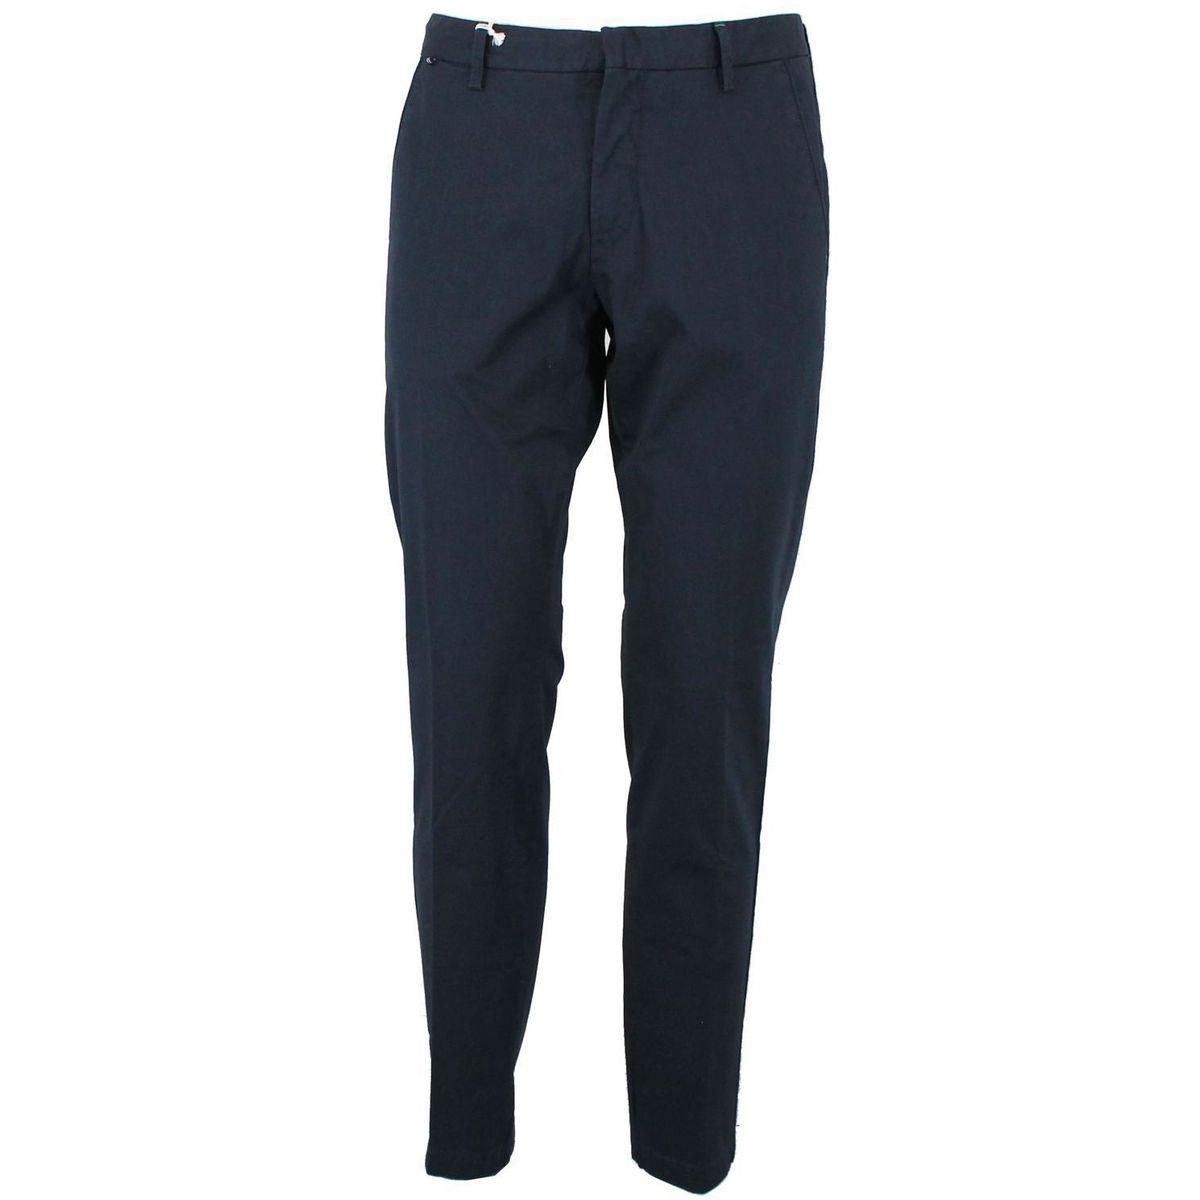 Pantalone chino in cotone stretch Blue At.p.co